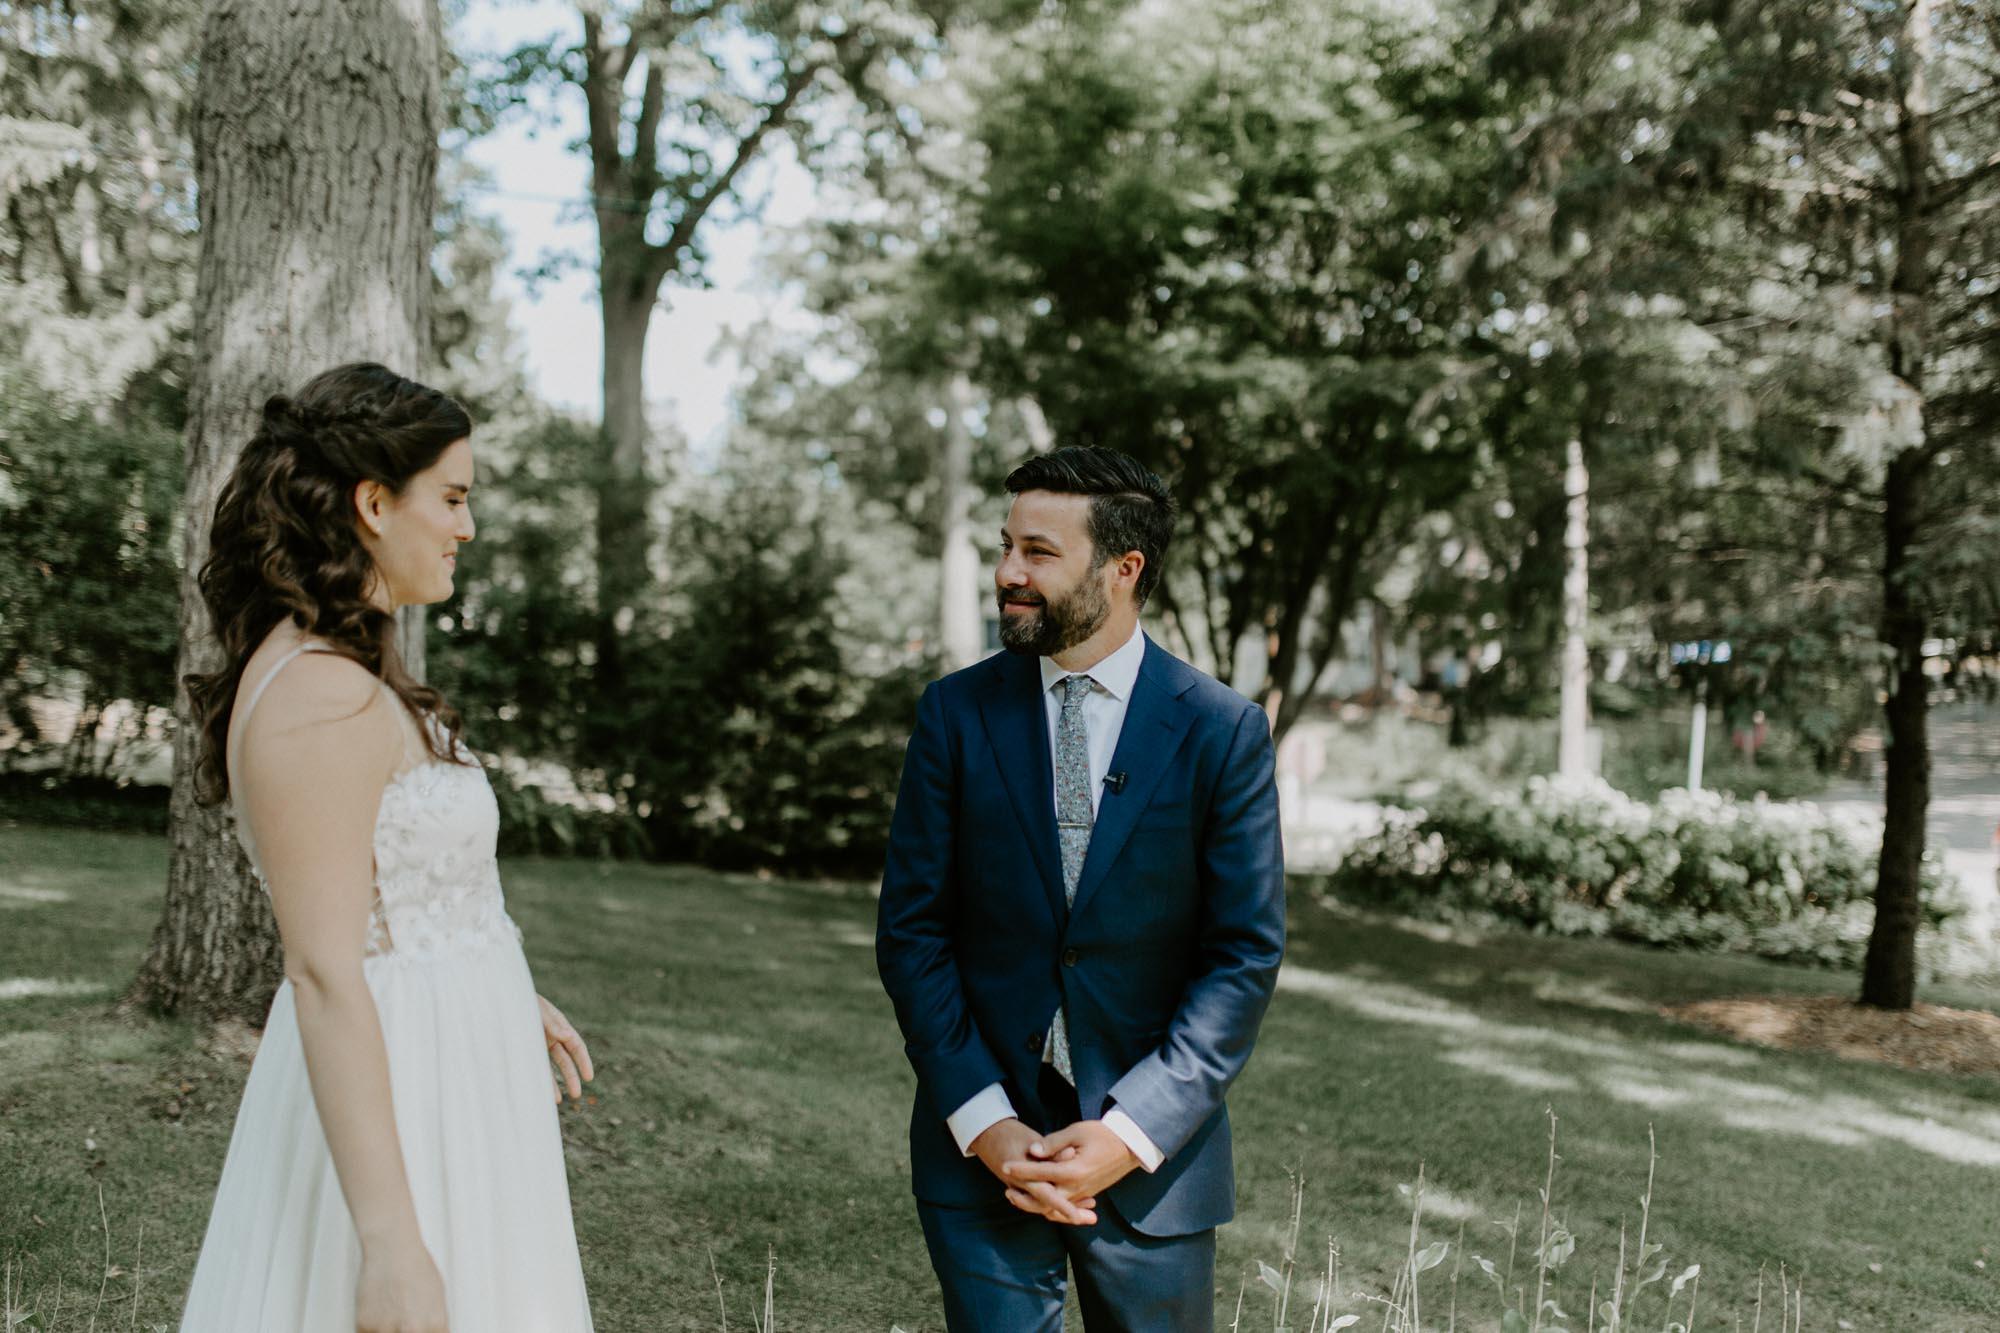 journeyman_distillery_wedding_photographer_chicago_il_wright_photographs-1418.jpg